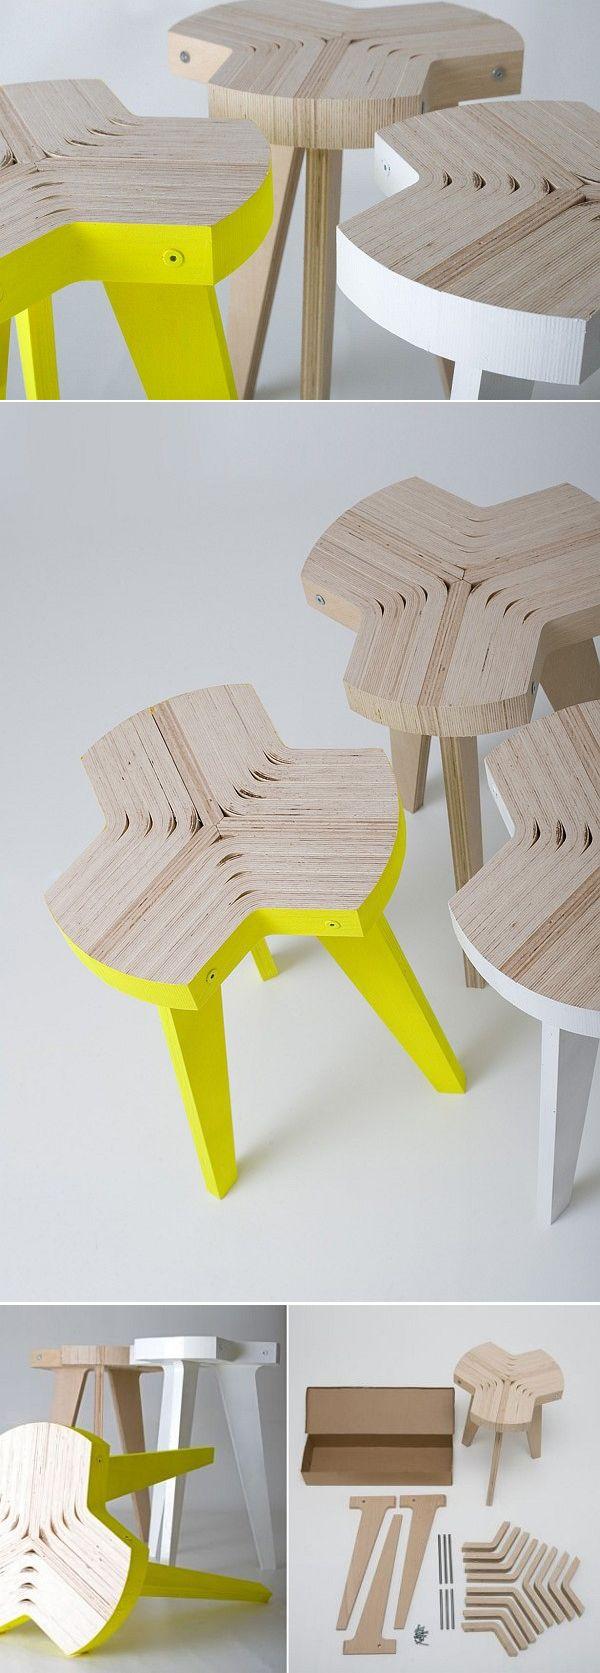 Plywood + Color Pop